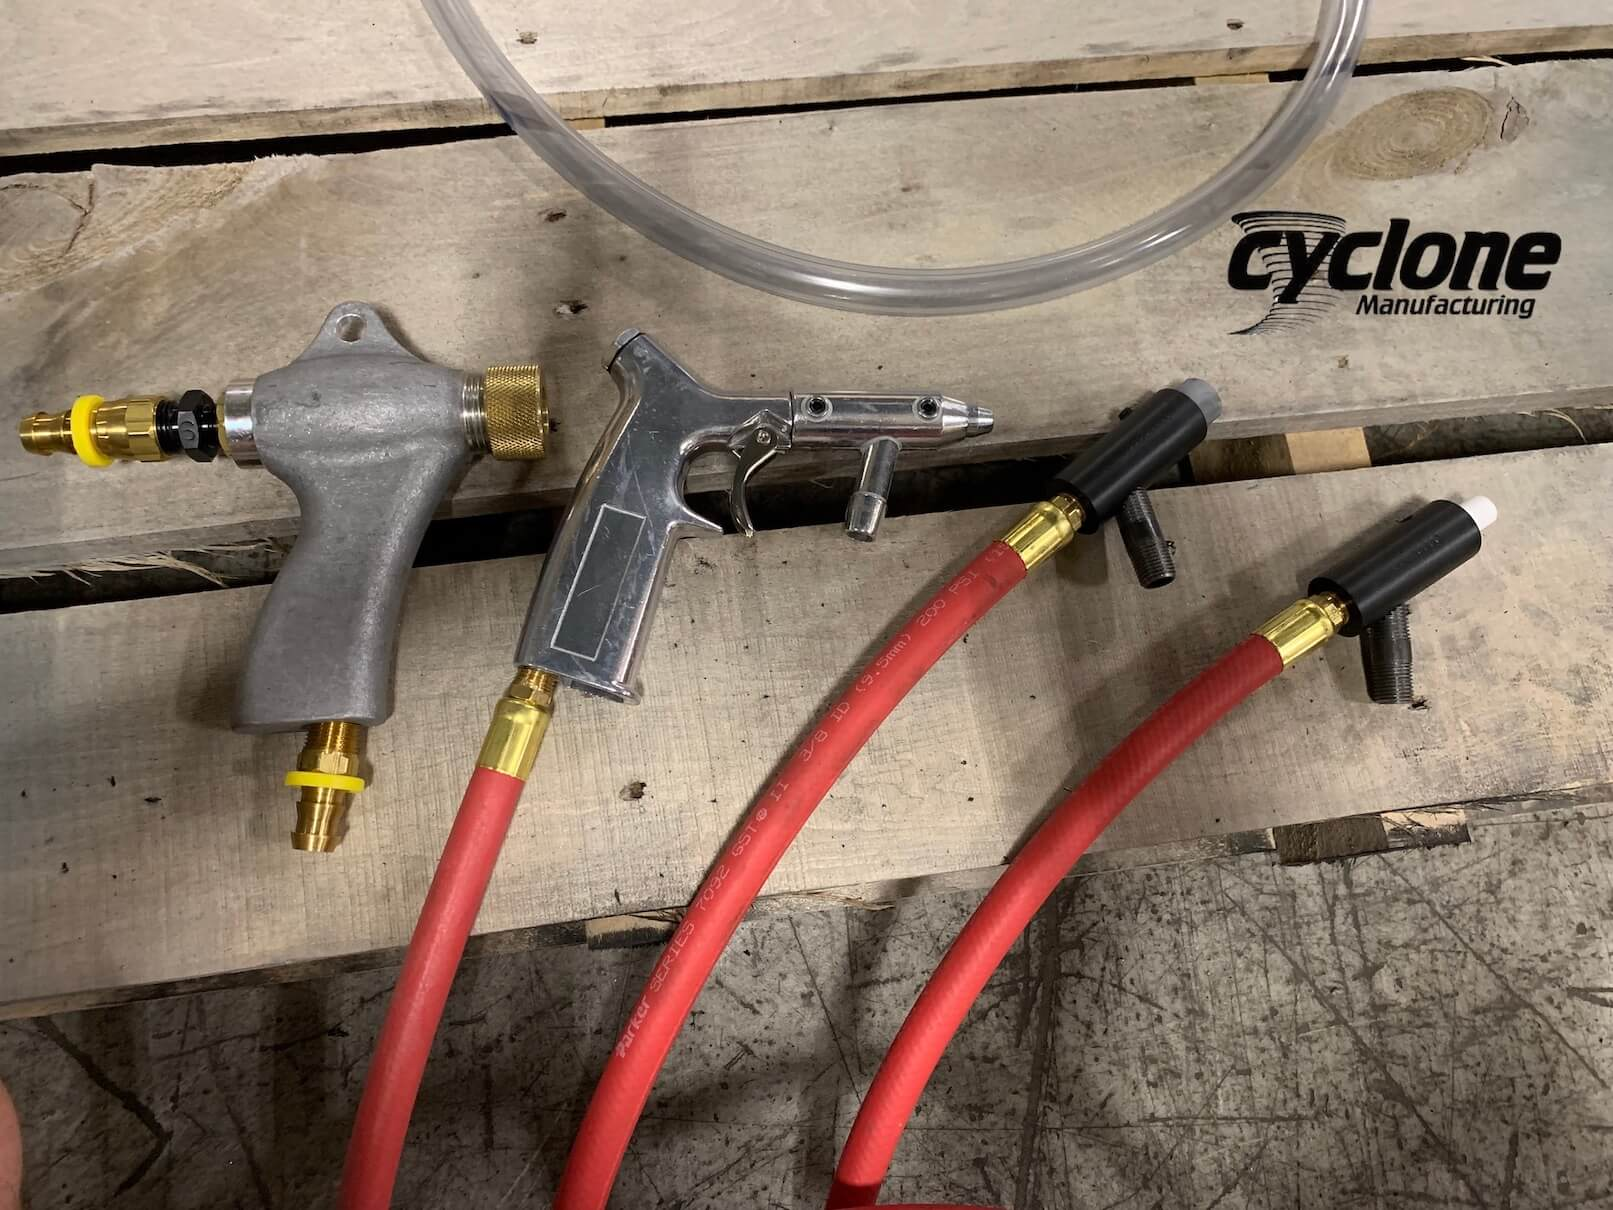 sandblasting-gun-comparison-cyclone